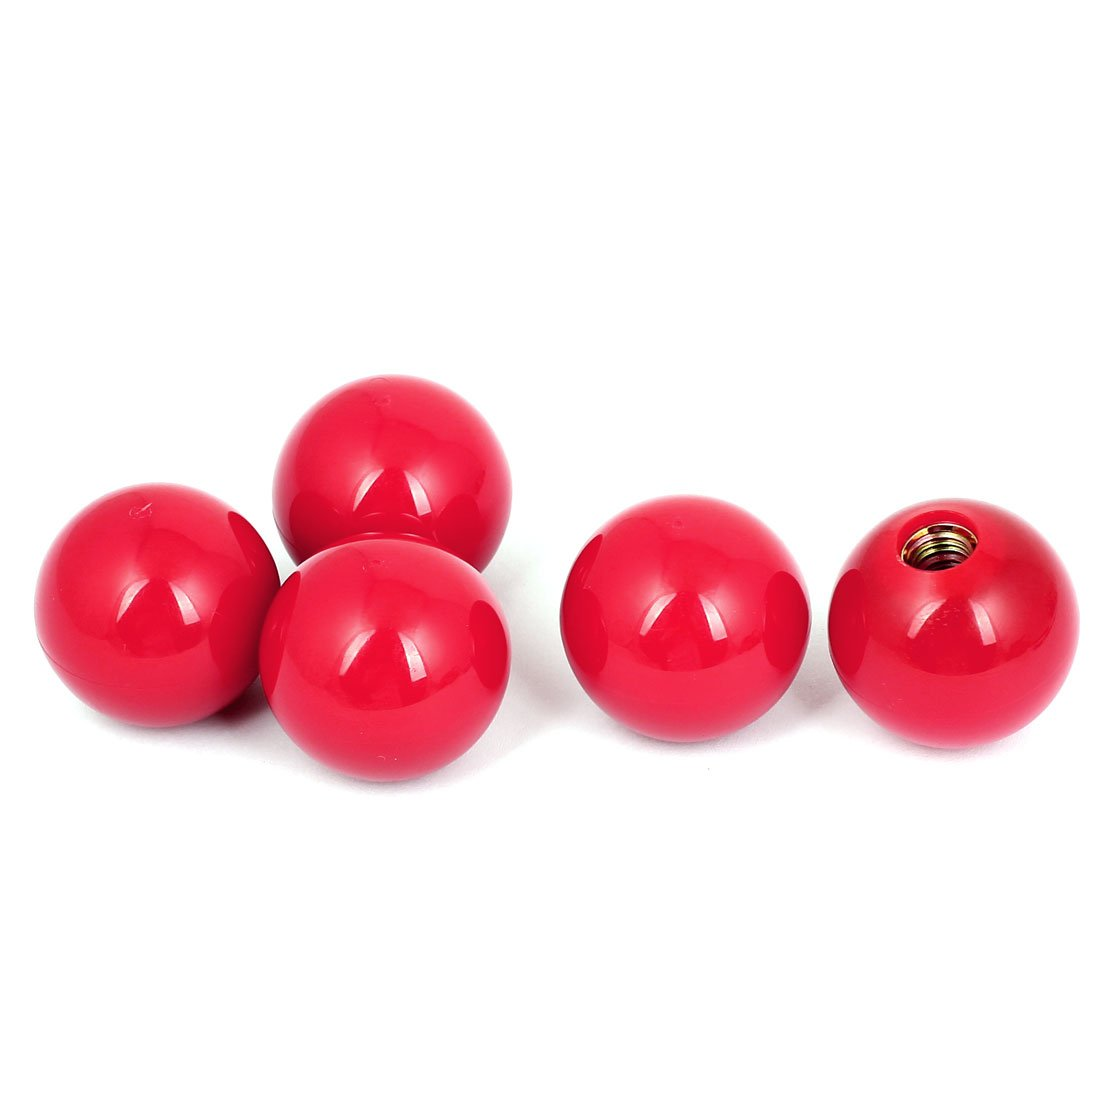 38mm Diameter M10 Bore Plastic Ball Knobs Machine Handles Red 5 Pcs